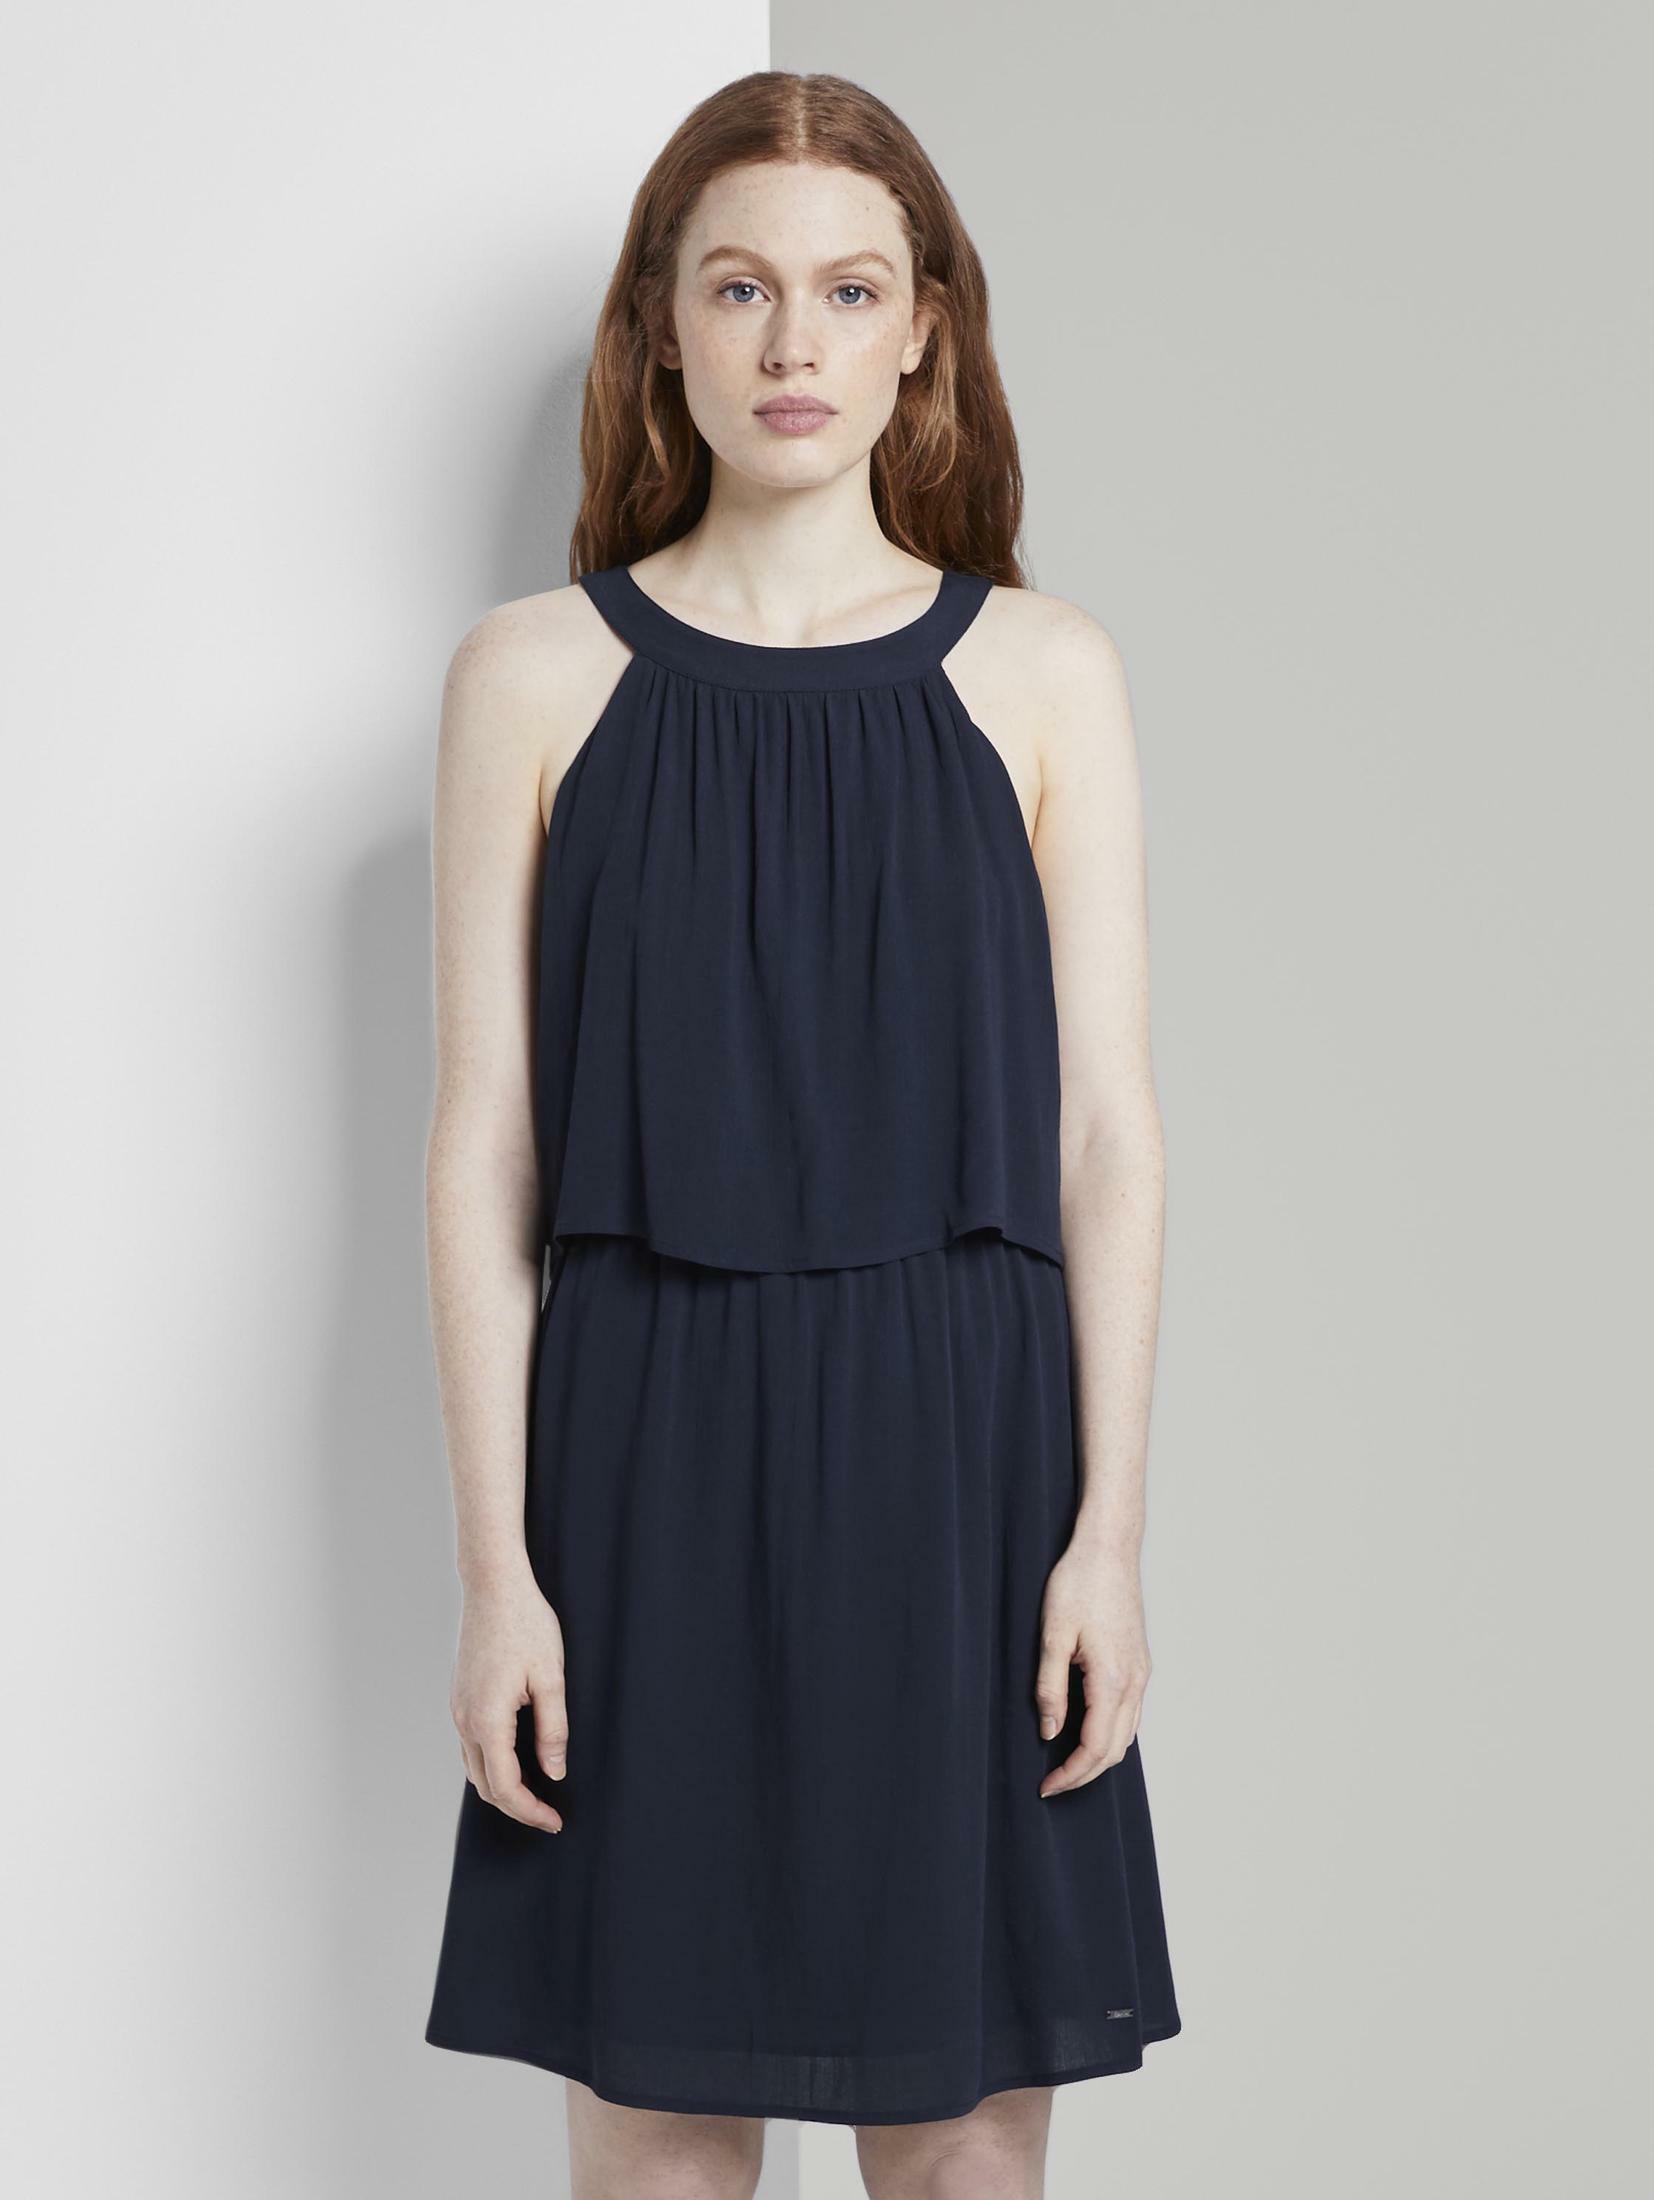 TOM TAILOR Denim Minikleid Neckholder Minikleid Damenmode/Bekleidung/Kleider/Minikleider